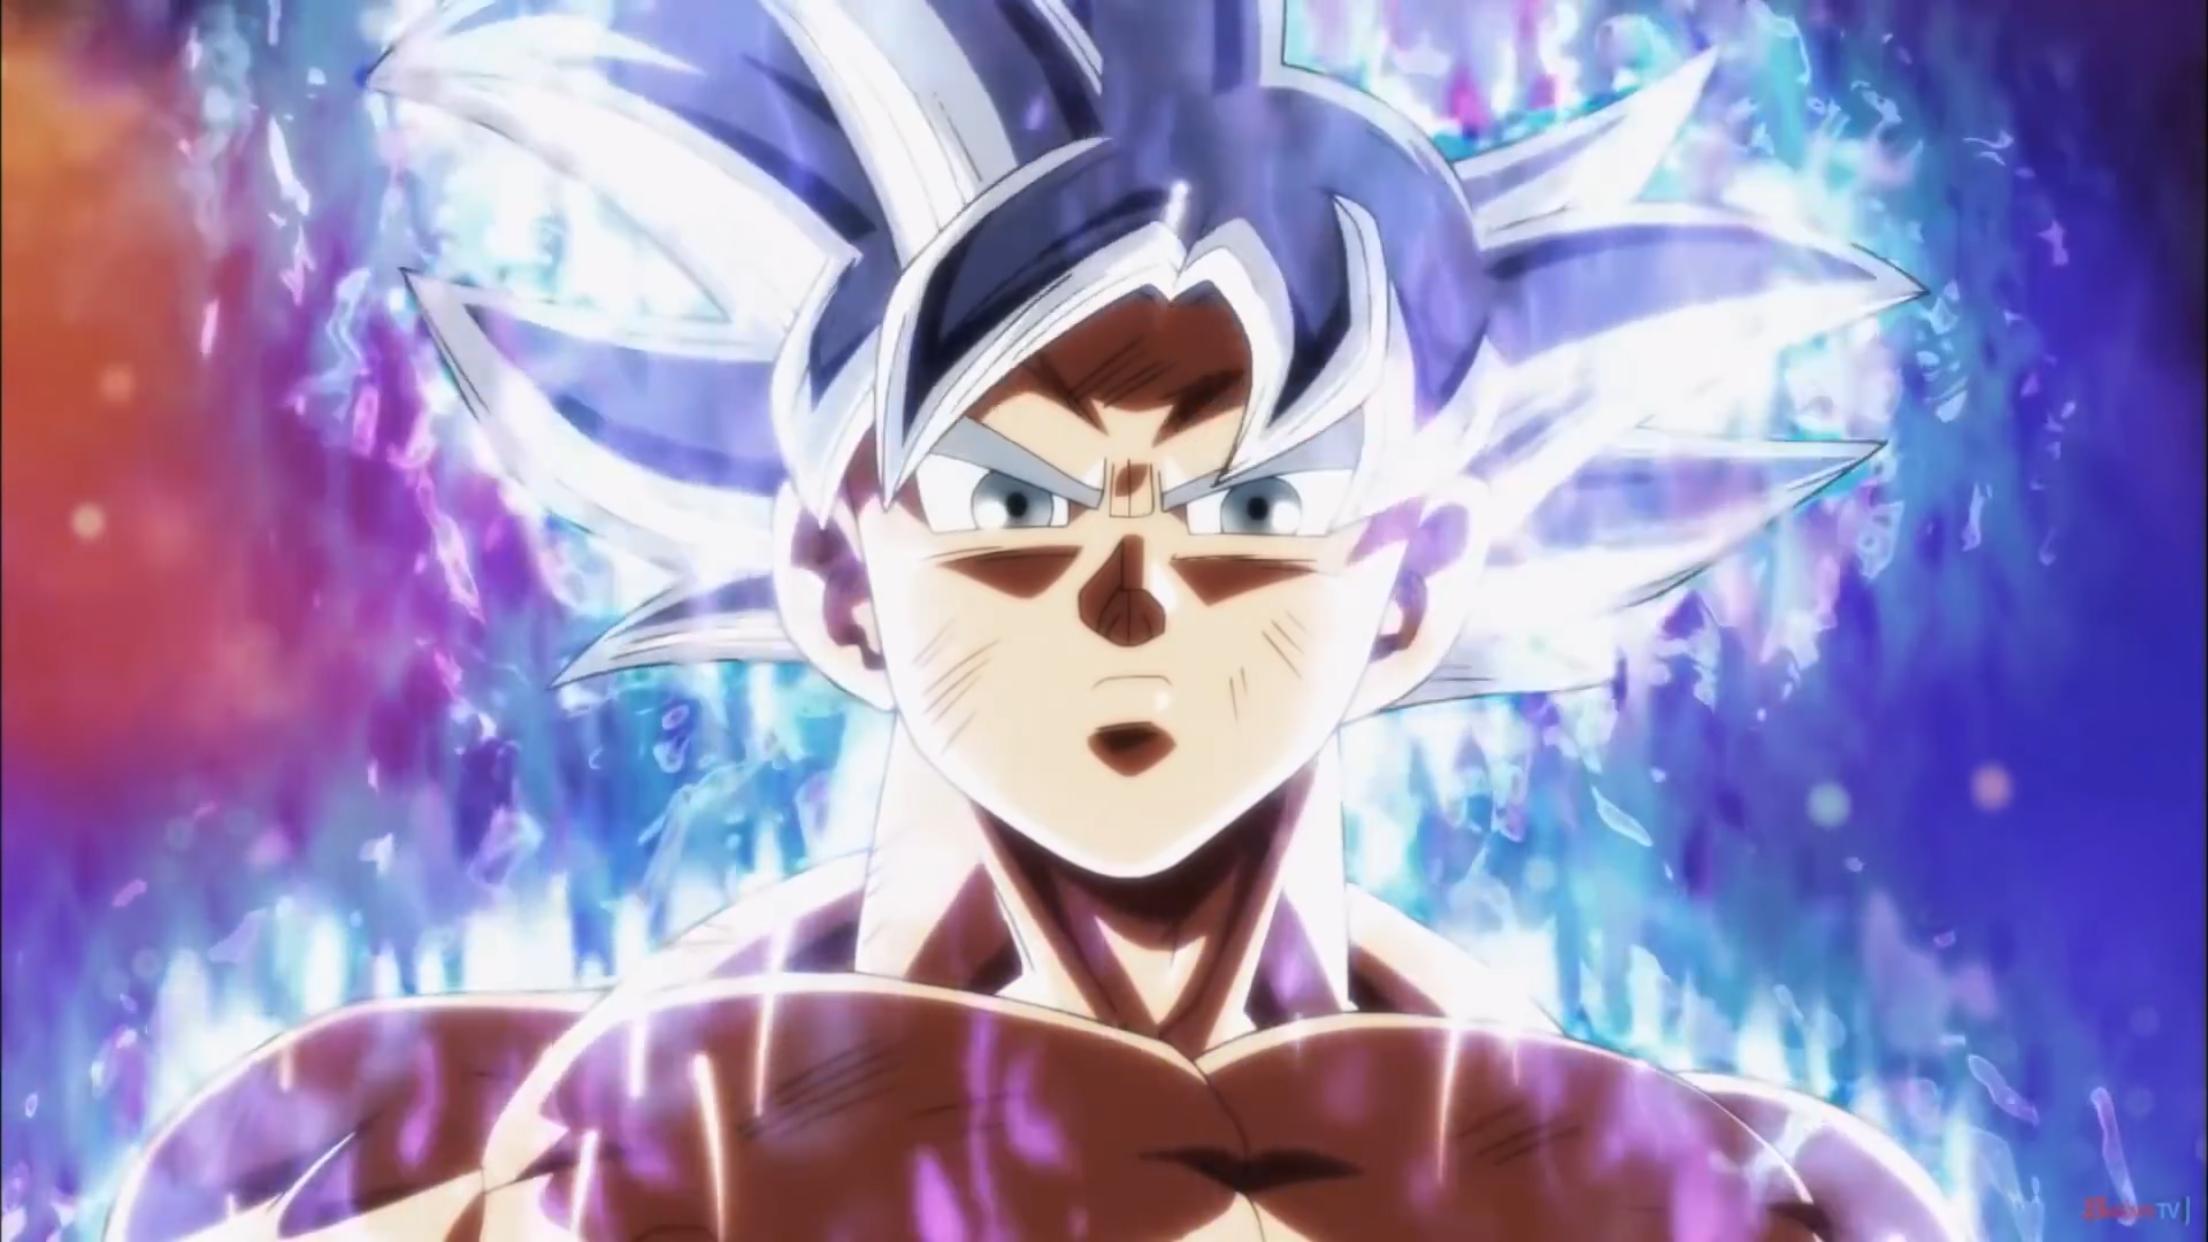 Goku Mastered Ultra Instinct Dragon Ball Goku Vs Jiren Anime